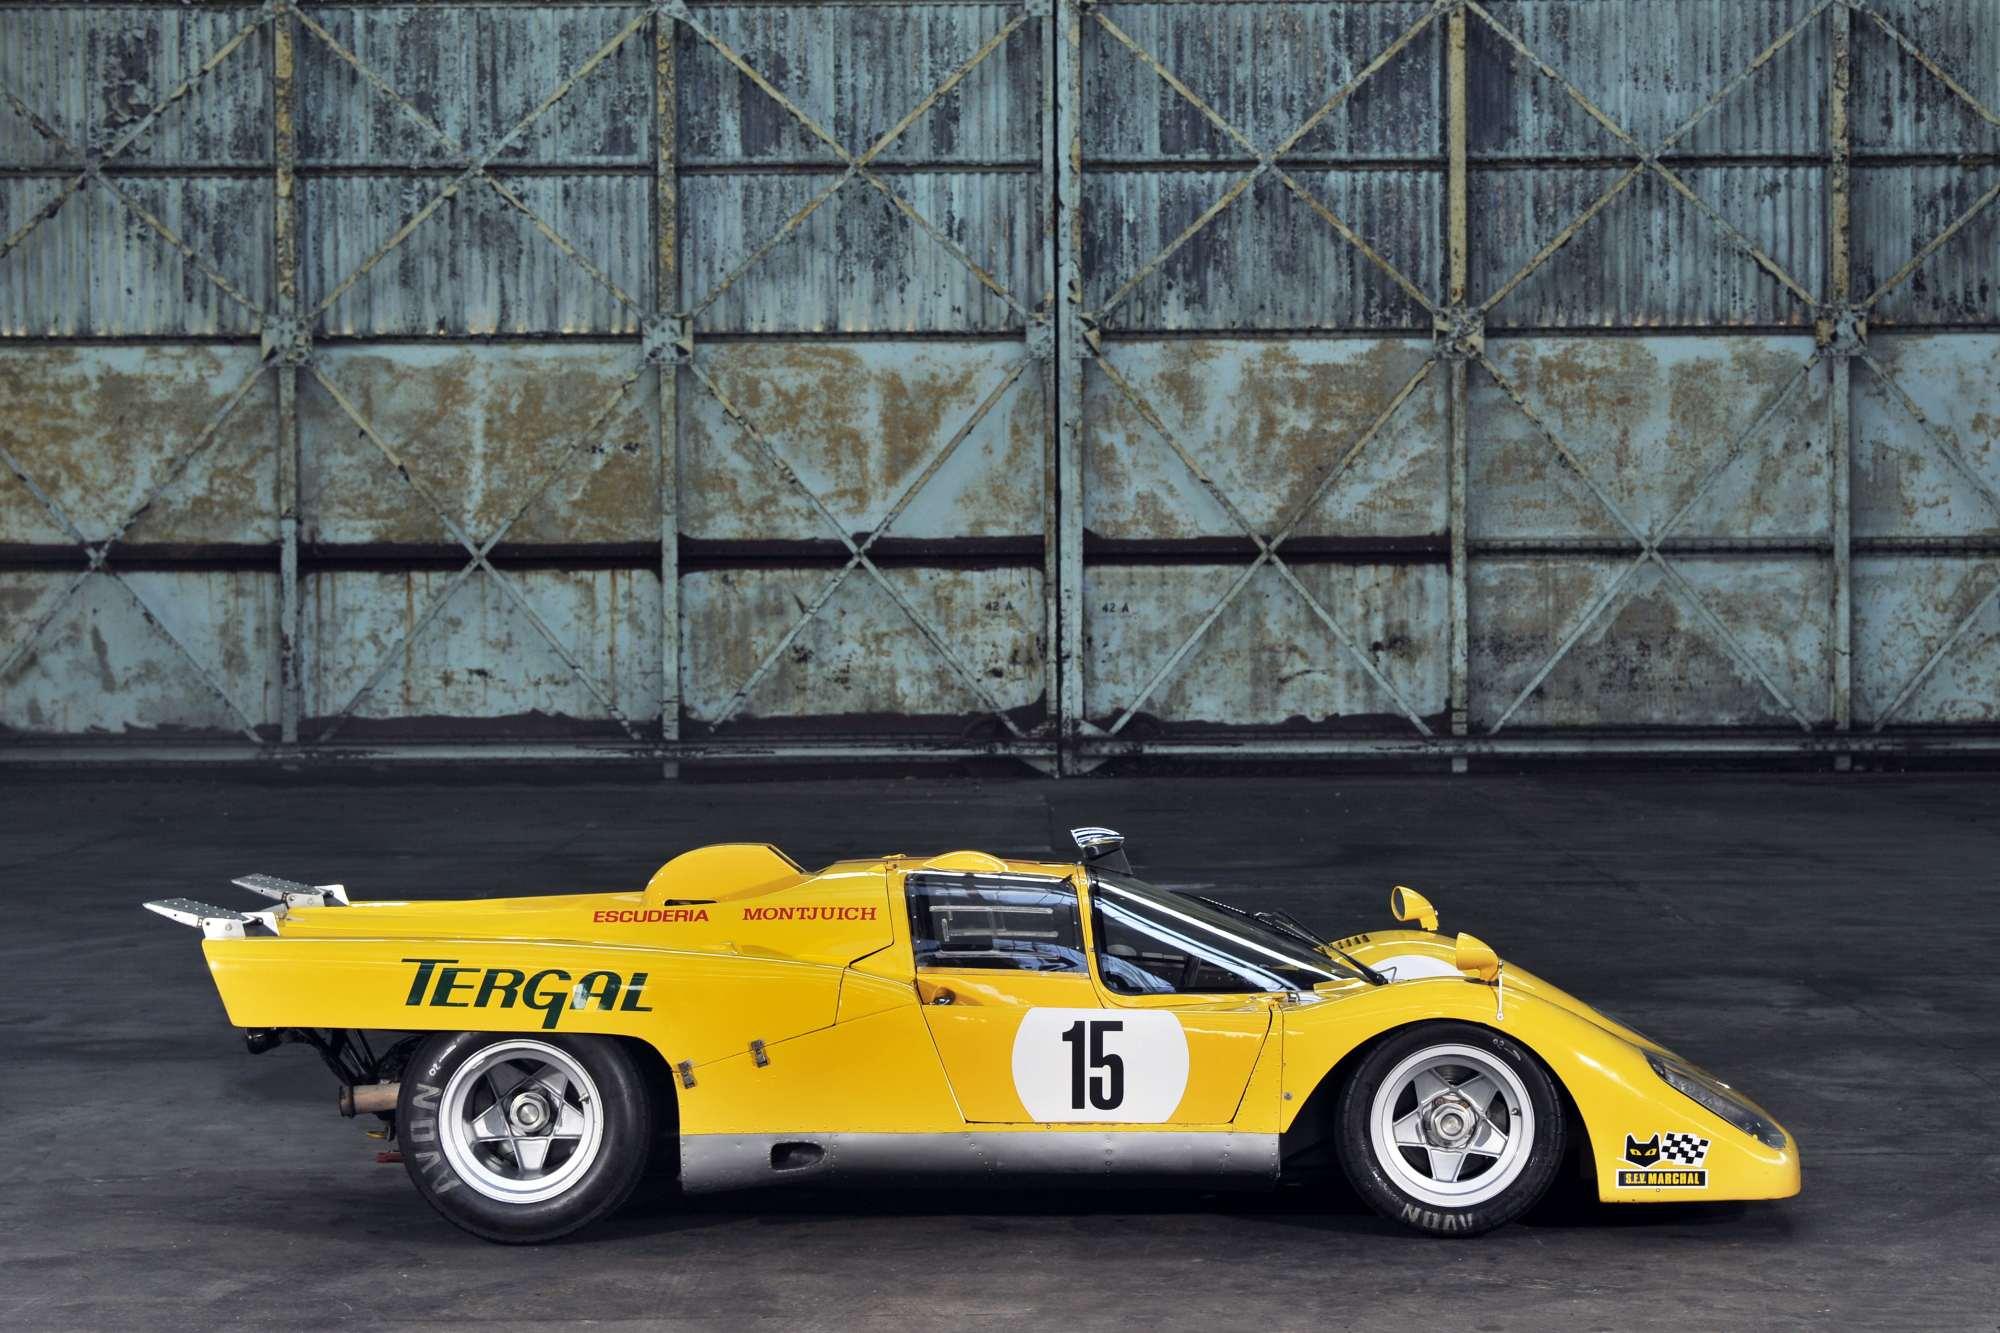 Charming 1970 Ferrari 512M